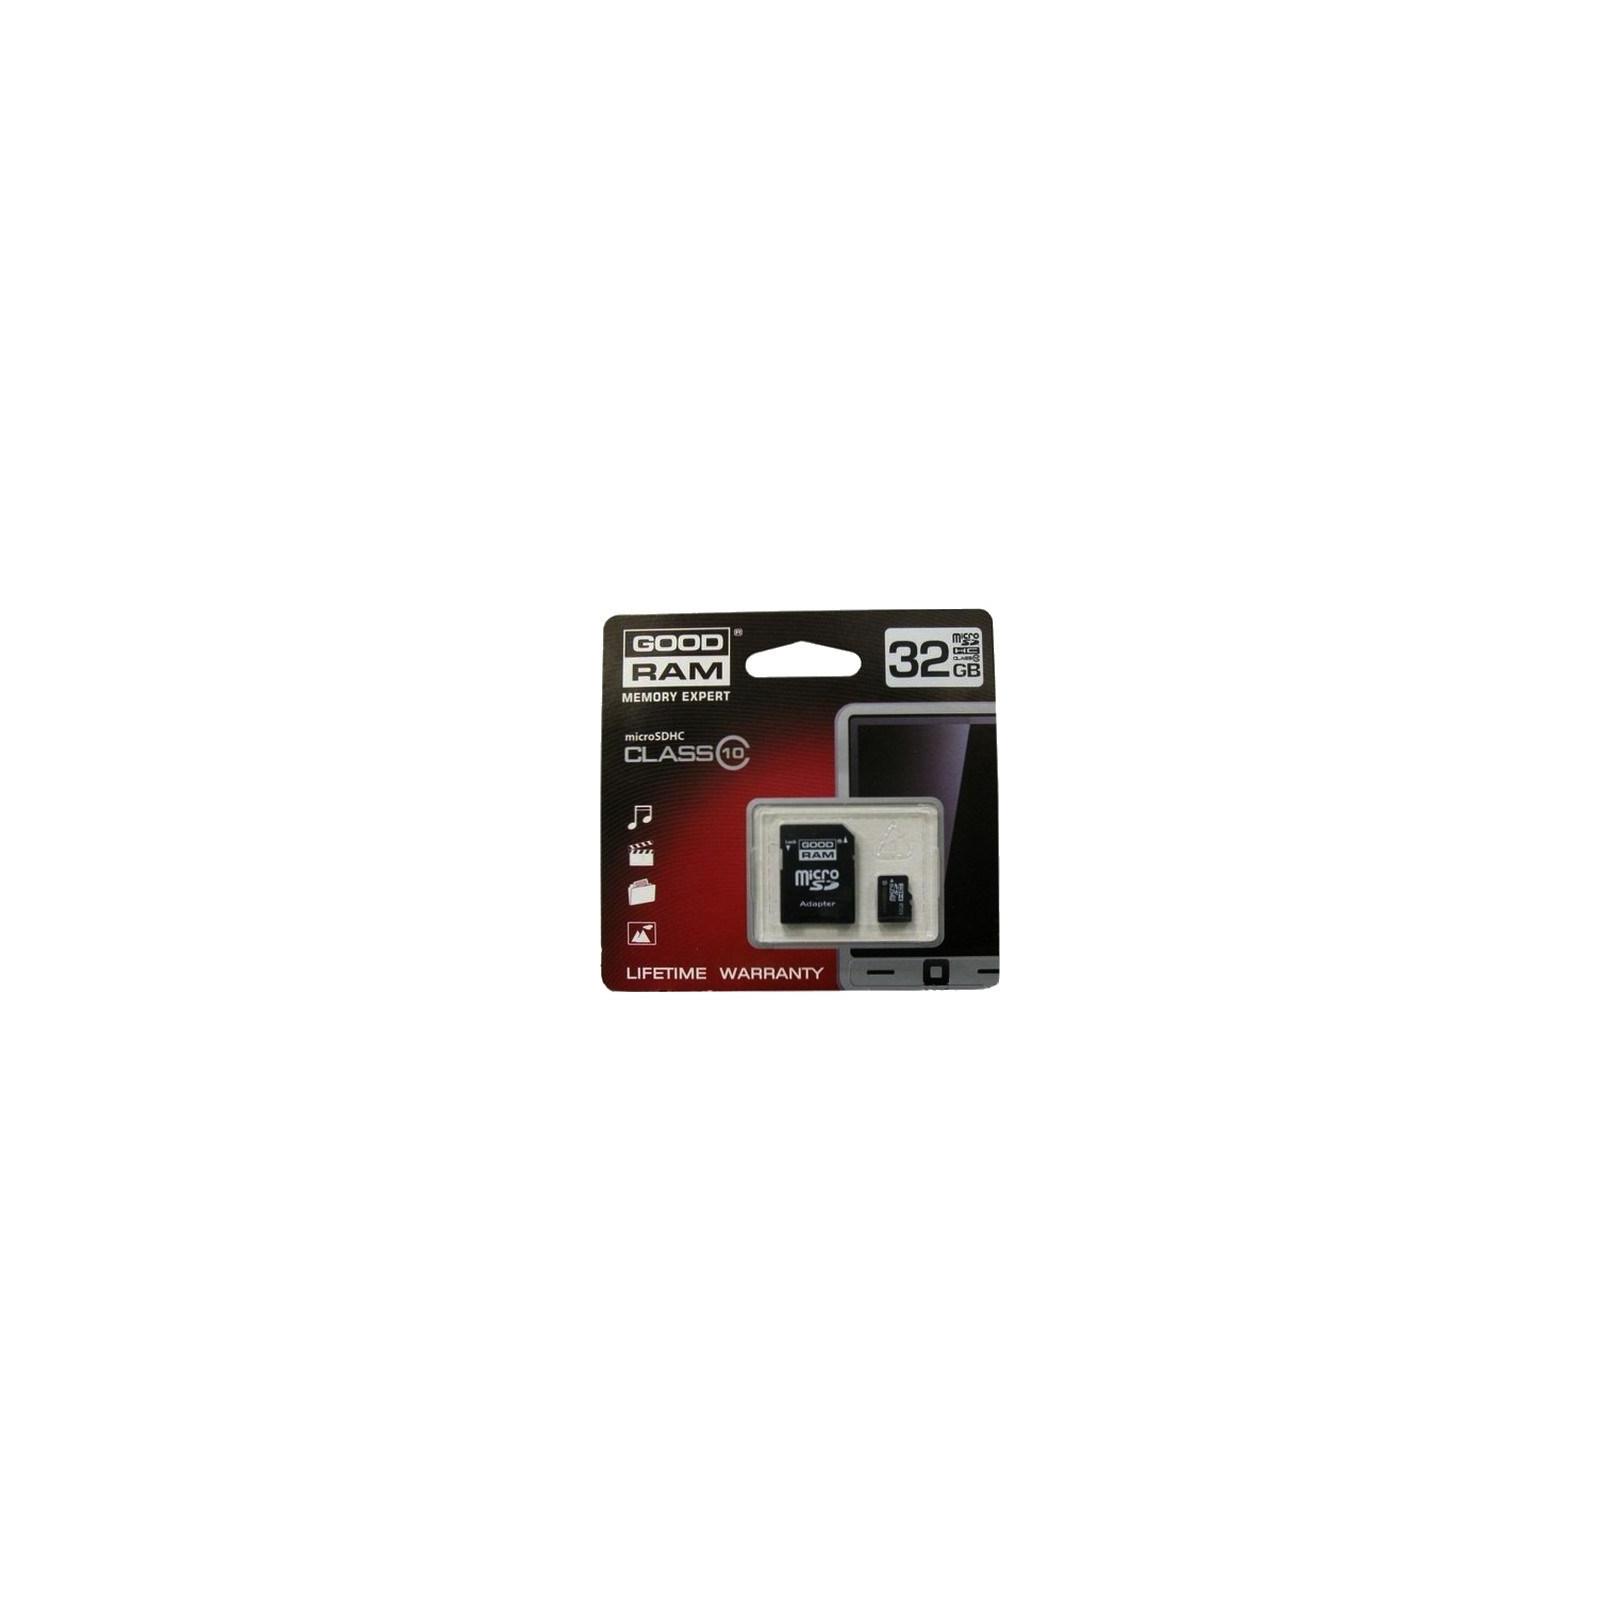 Карта памяти GOODRAM 32Gb microSDHC class 10 (SDU32GHC10AGRR10 / SDU32GHC10AGRR9)